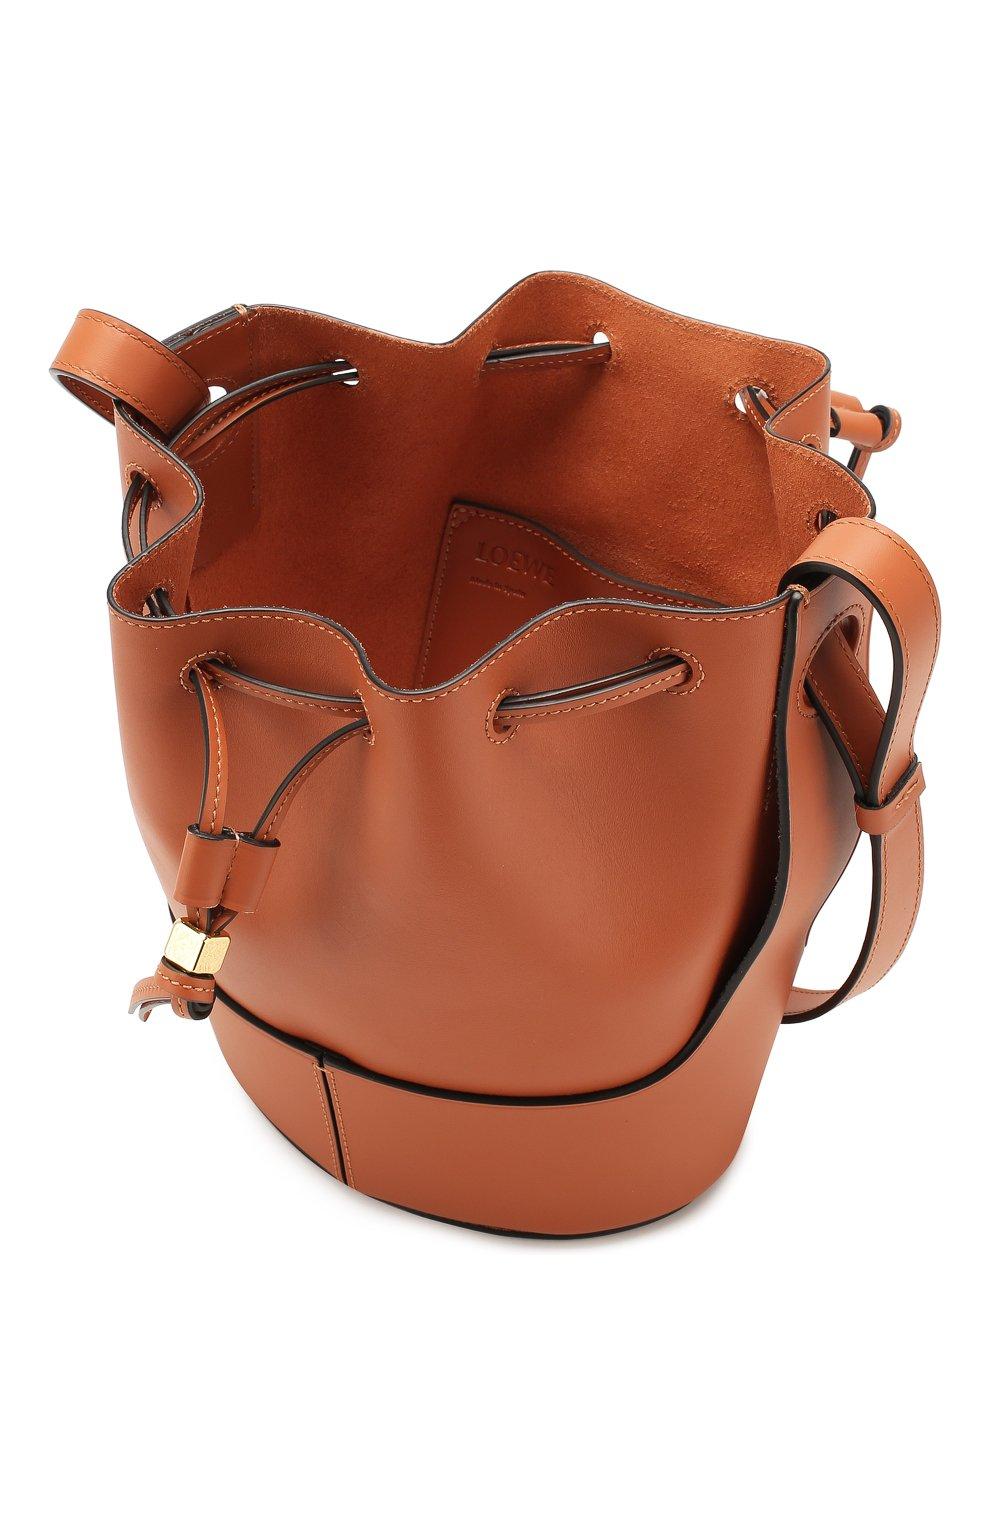 Женская сумка balloon small LOEWE светло-коричневого цвета, арт. 326.75AC31   Фото 4 (Сумки-технические: Сумки через плечо; Материал: Натуральная кожа; Ремень/цепочка: На ремешке; Размер: small)